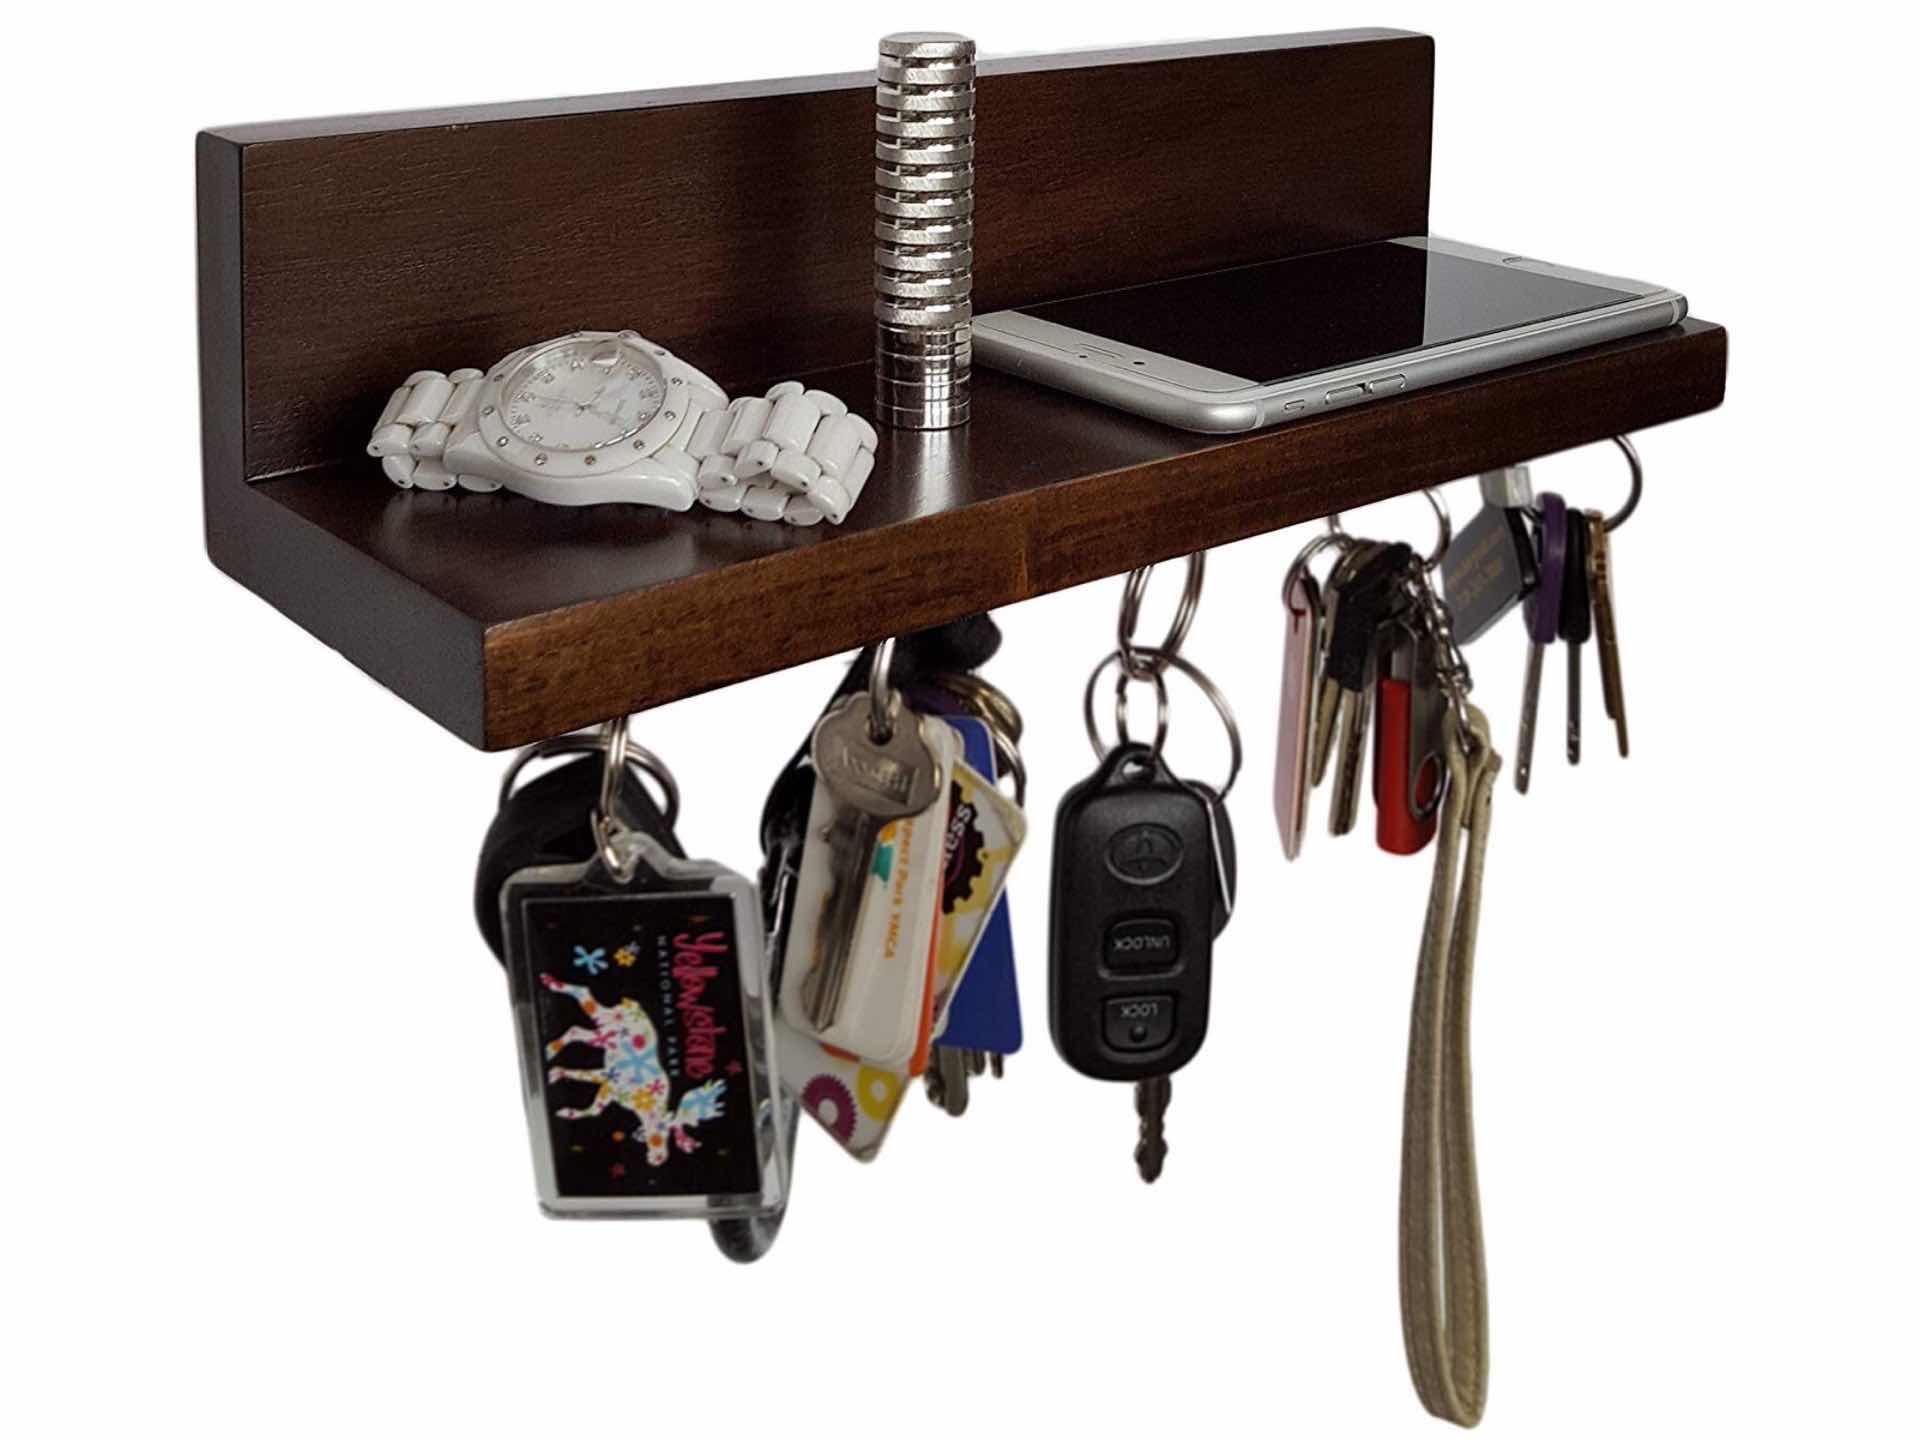 brooklyn-basix-magnetic-wood-keyring-holder-and-shelf